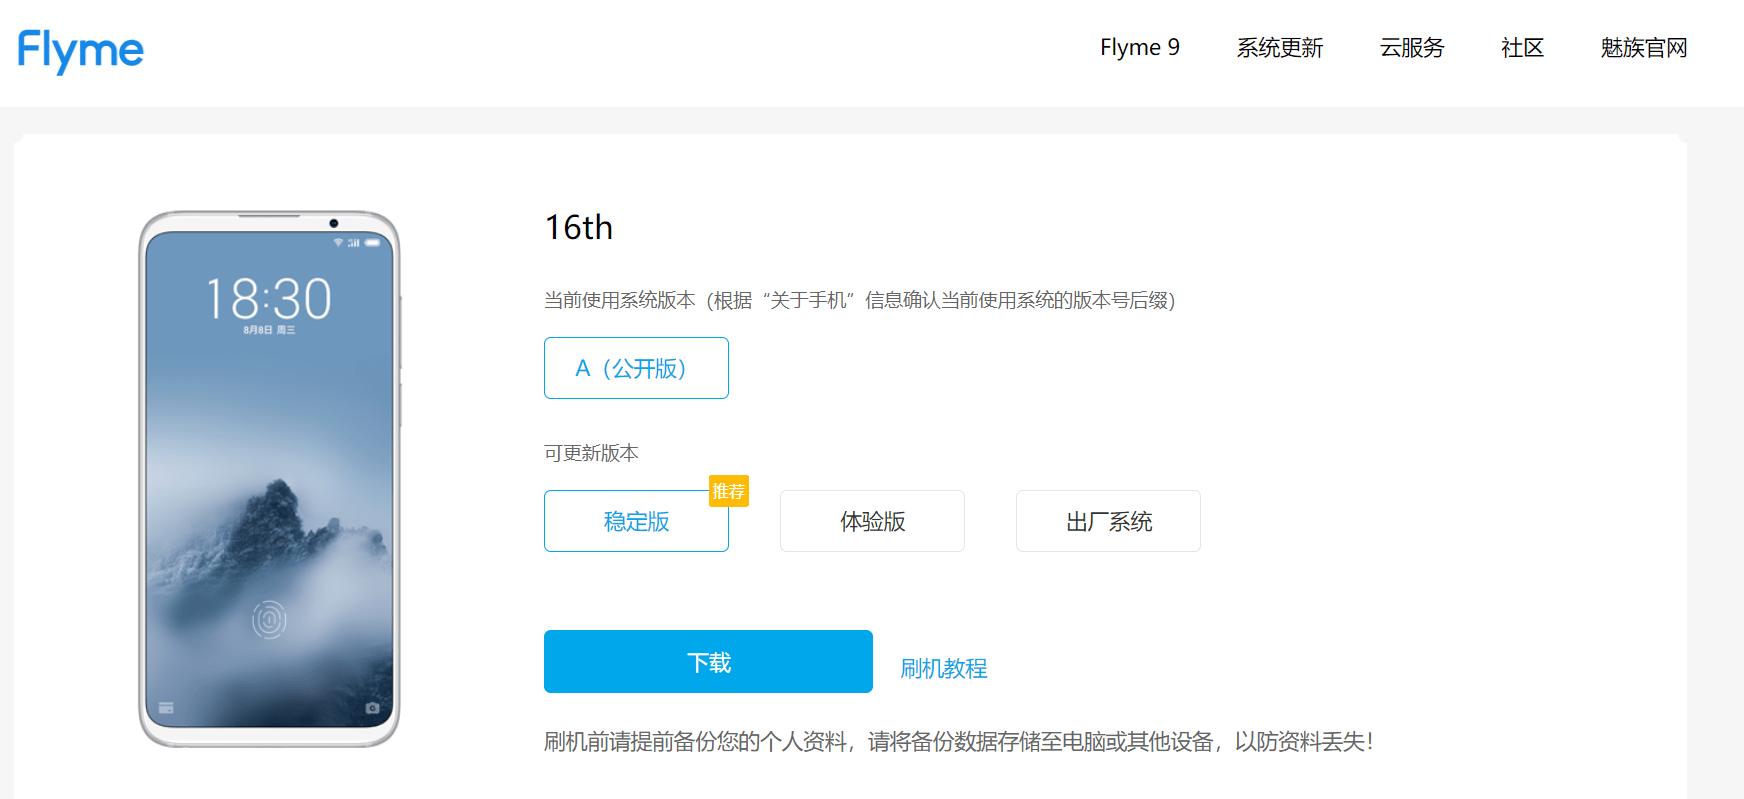 Meizu 16シリーズ用Flyme 9 Stableの配信予定は無し、Betaでの更新は継続